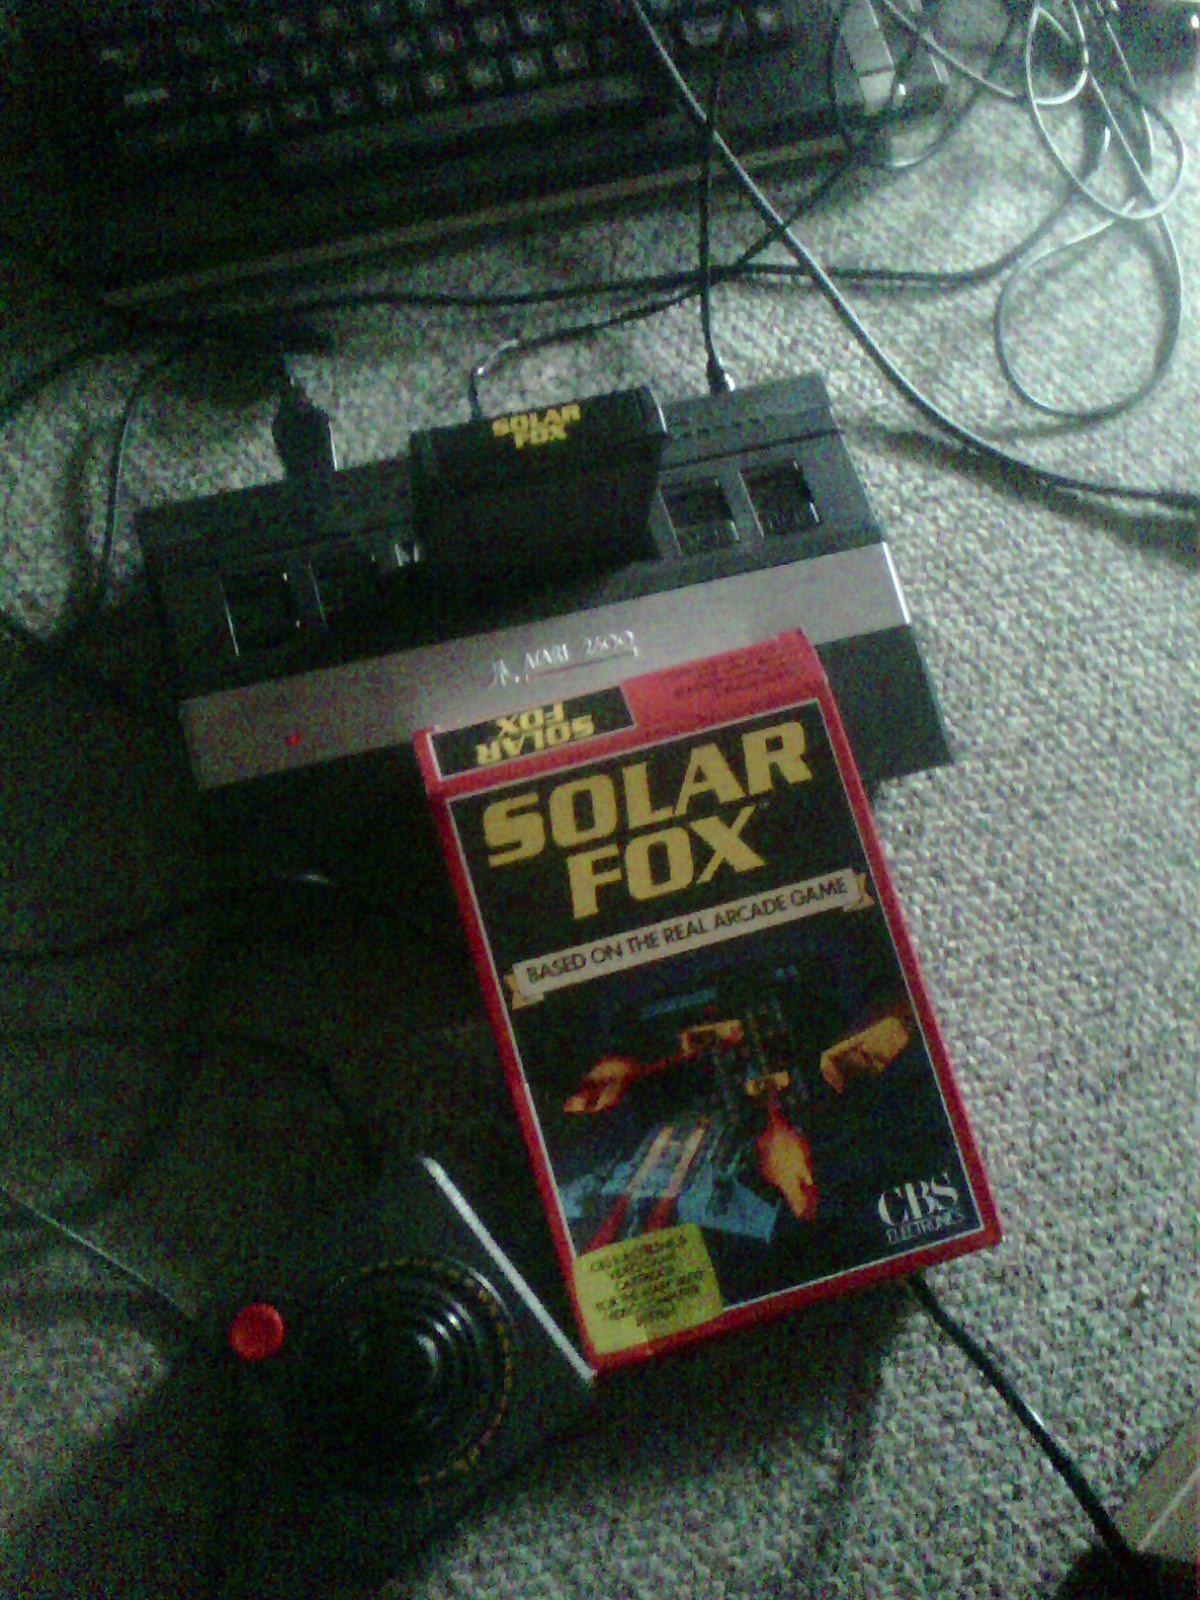 Solar Fox 100,200 points